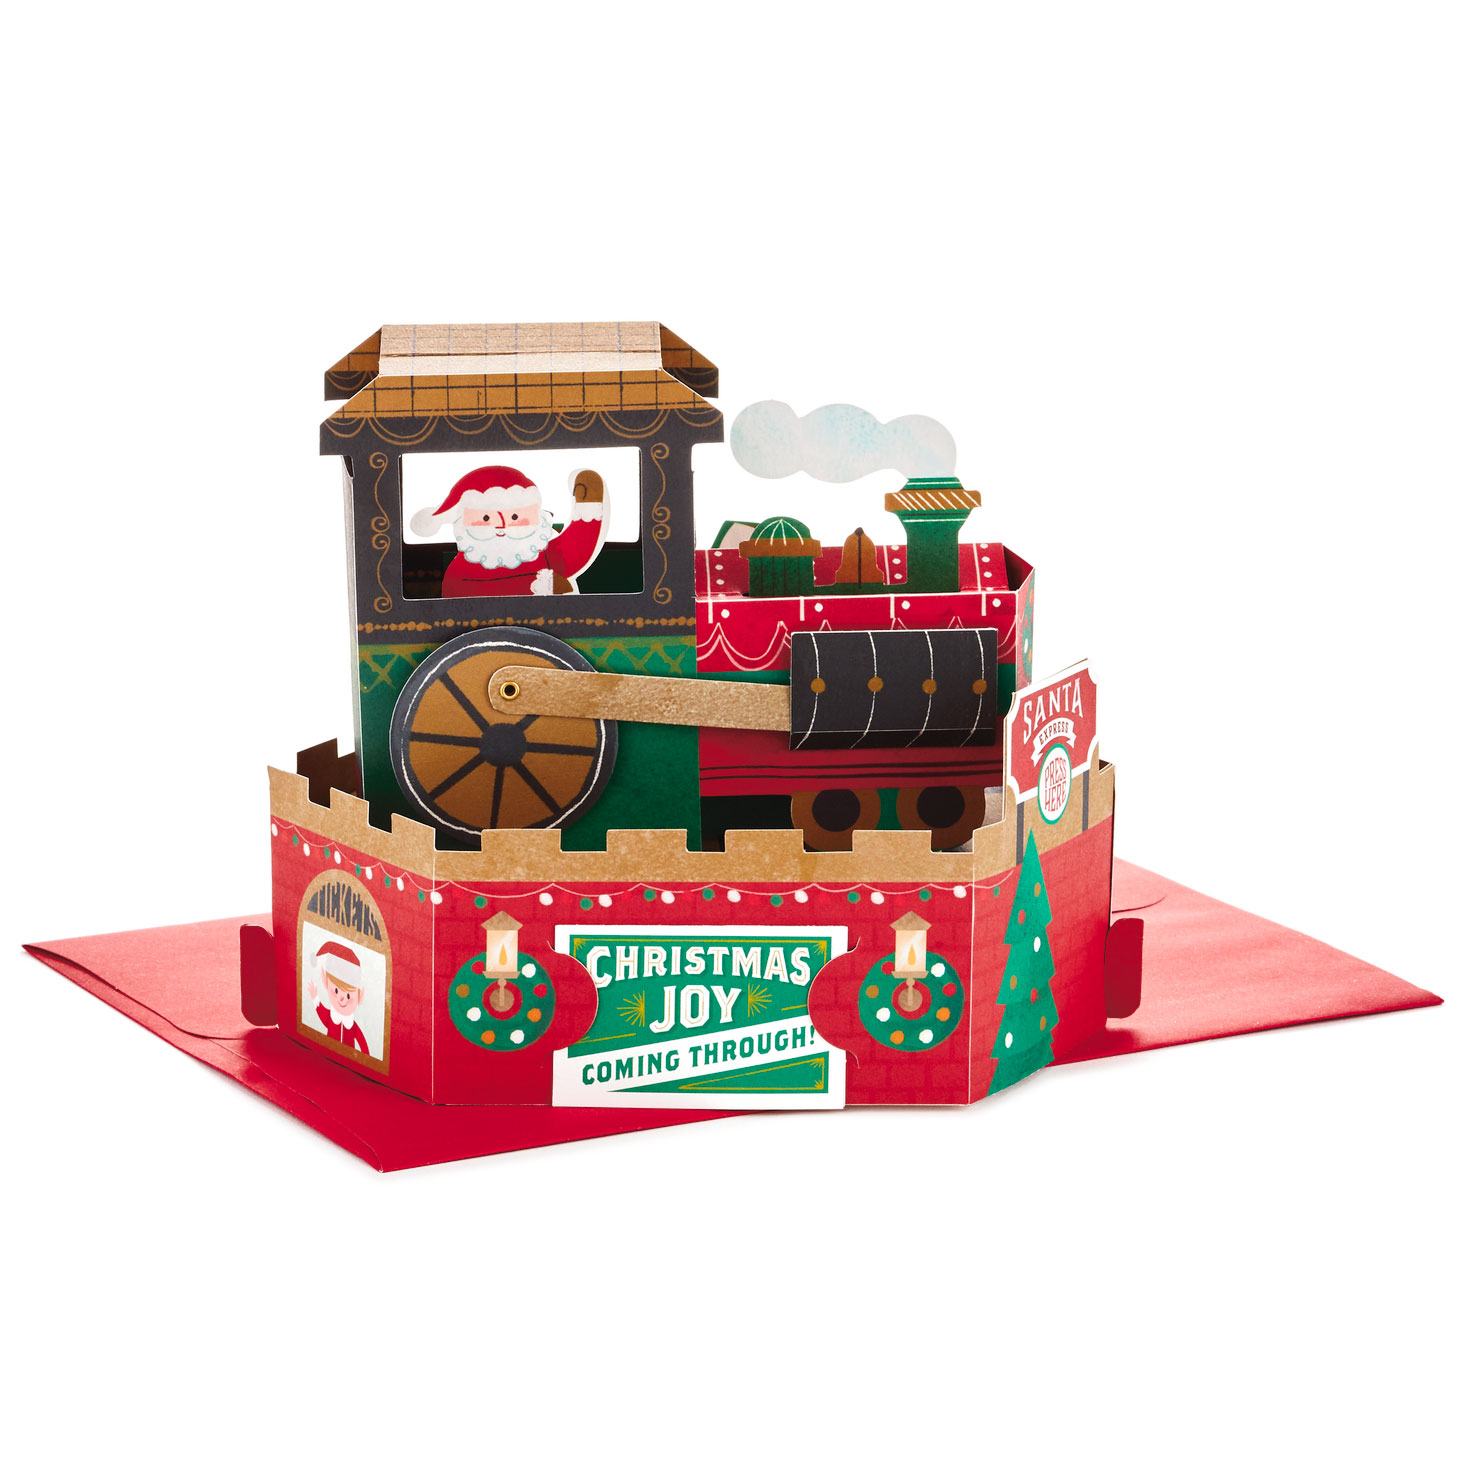 Hallmark Christmas Card ~ Musical Pop Up MOTION ~ Santa Claus Train WHEEL MOVES